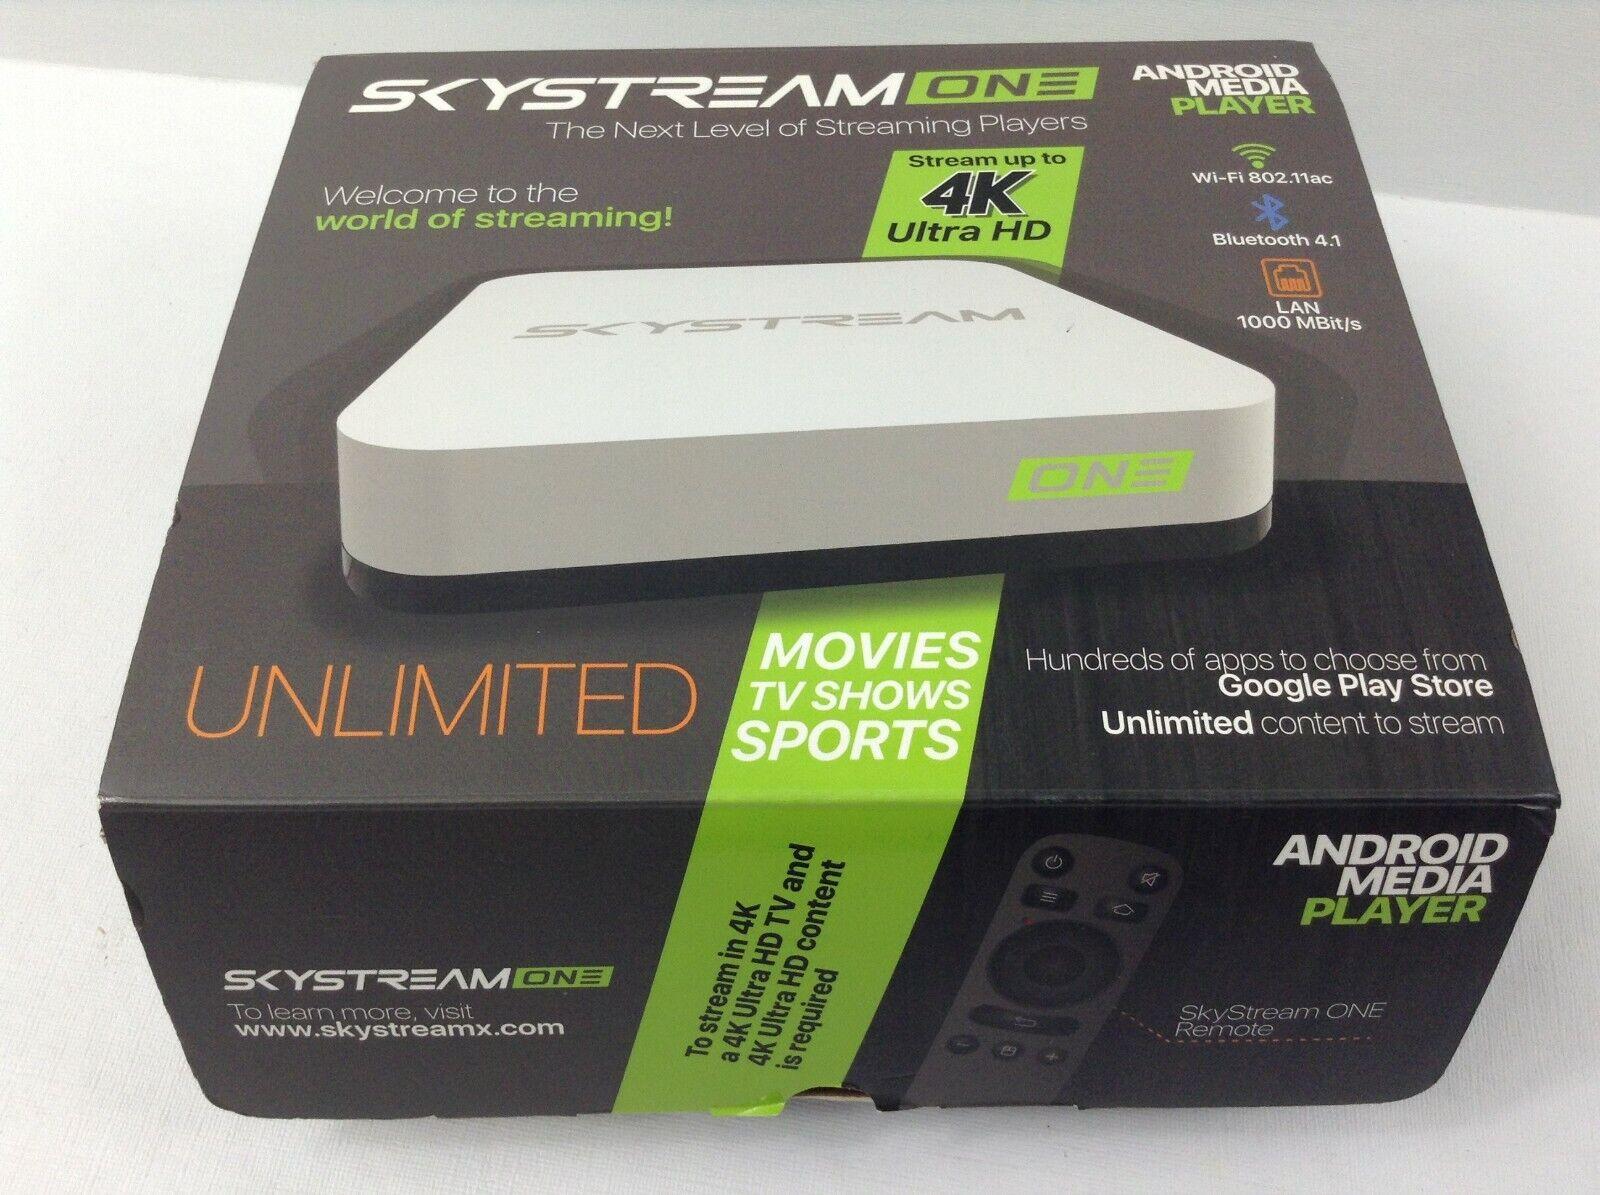 SkyStream - ONE Streaming Media Player - White media one player skystream streaming white